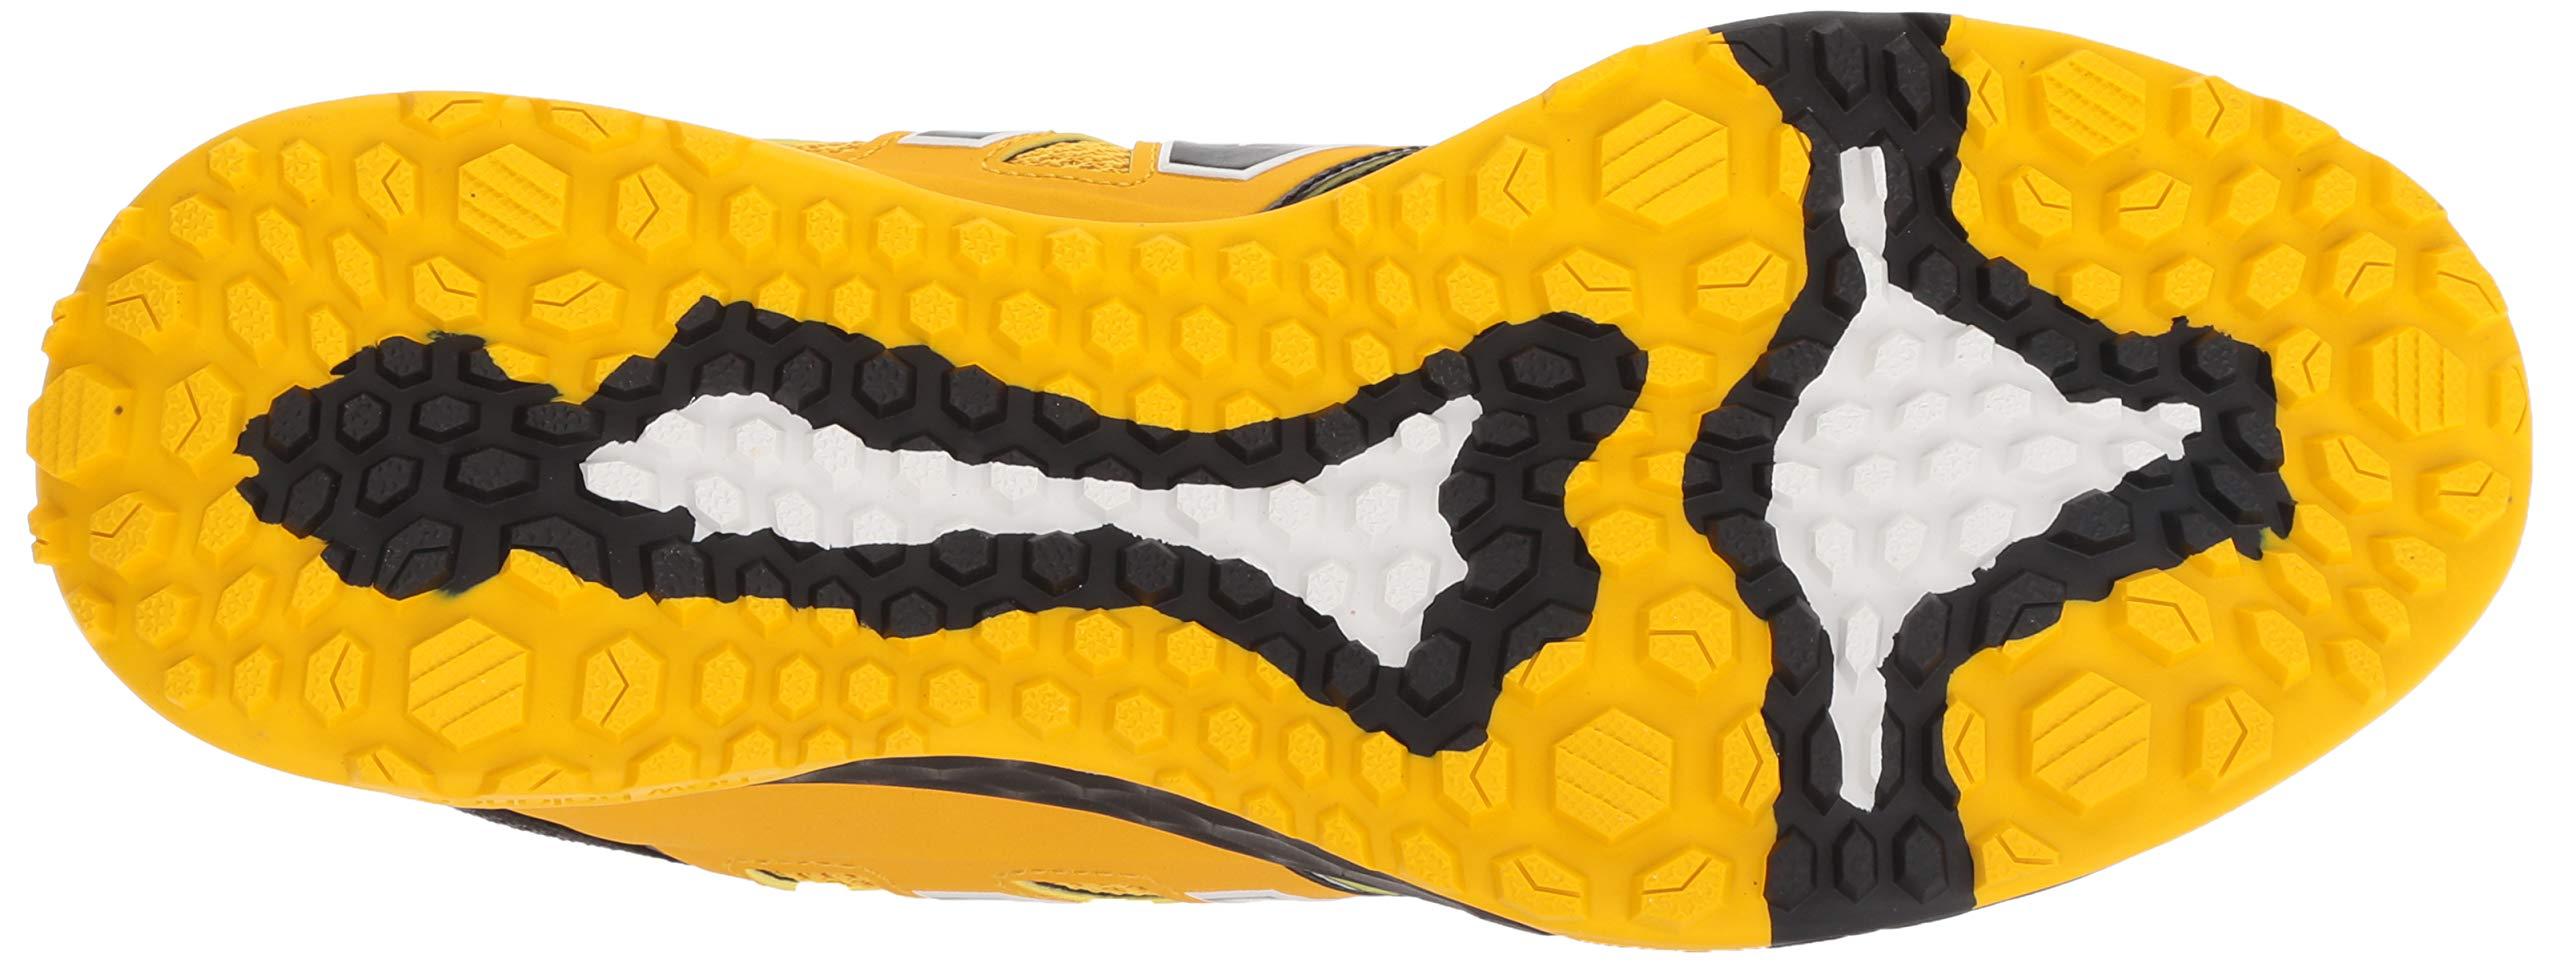 New Balance Men's 3000v4 Turf Baseball Shoe, Black/Yellow, 5 D US by New Balance (Image #3)